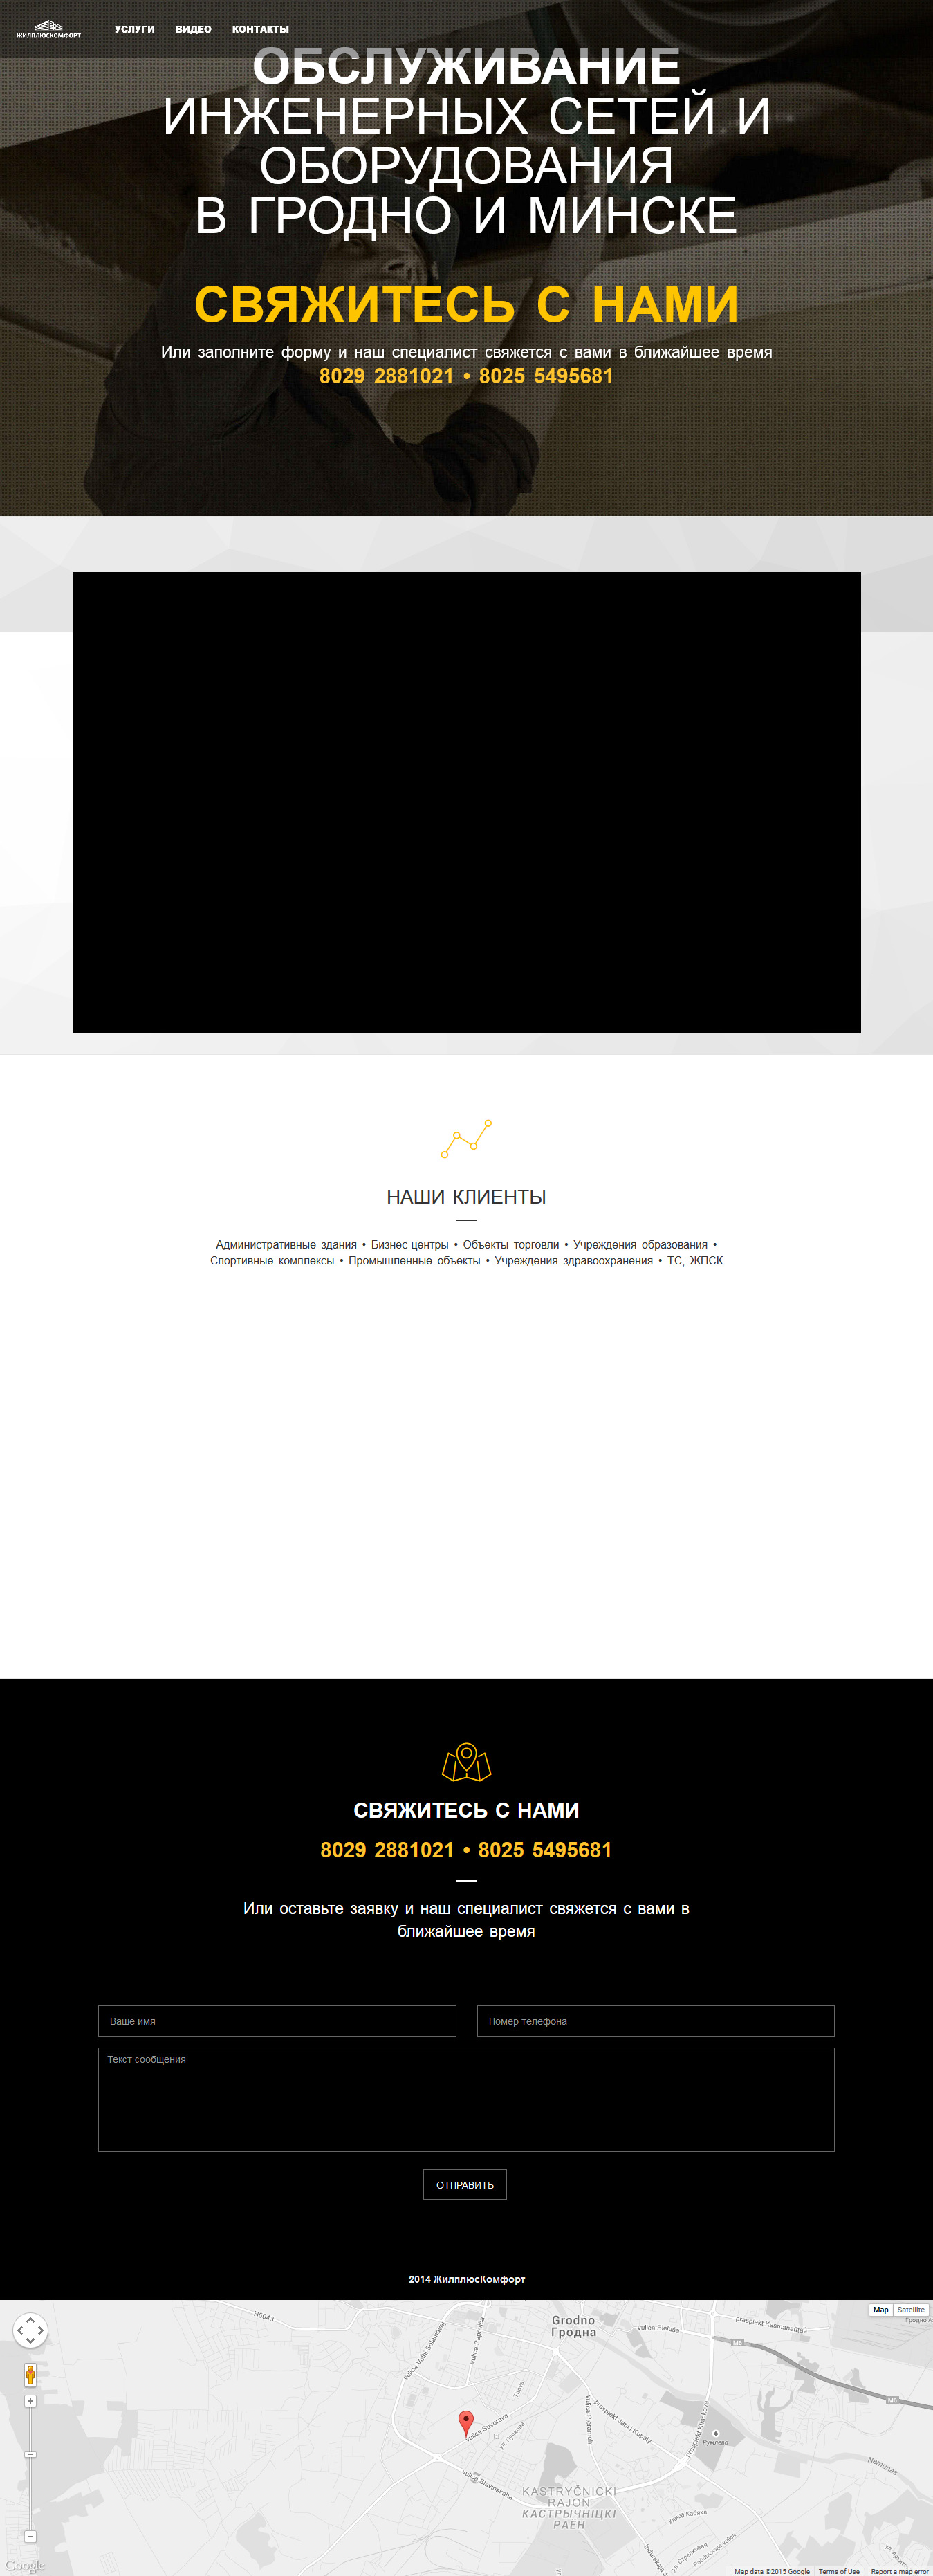 Жил+комфорт (верстка+интеграция wordpress)